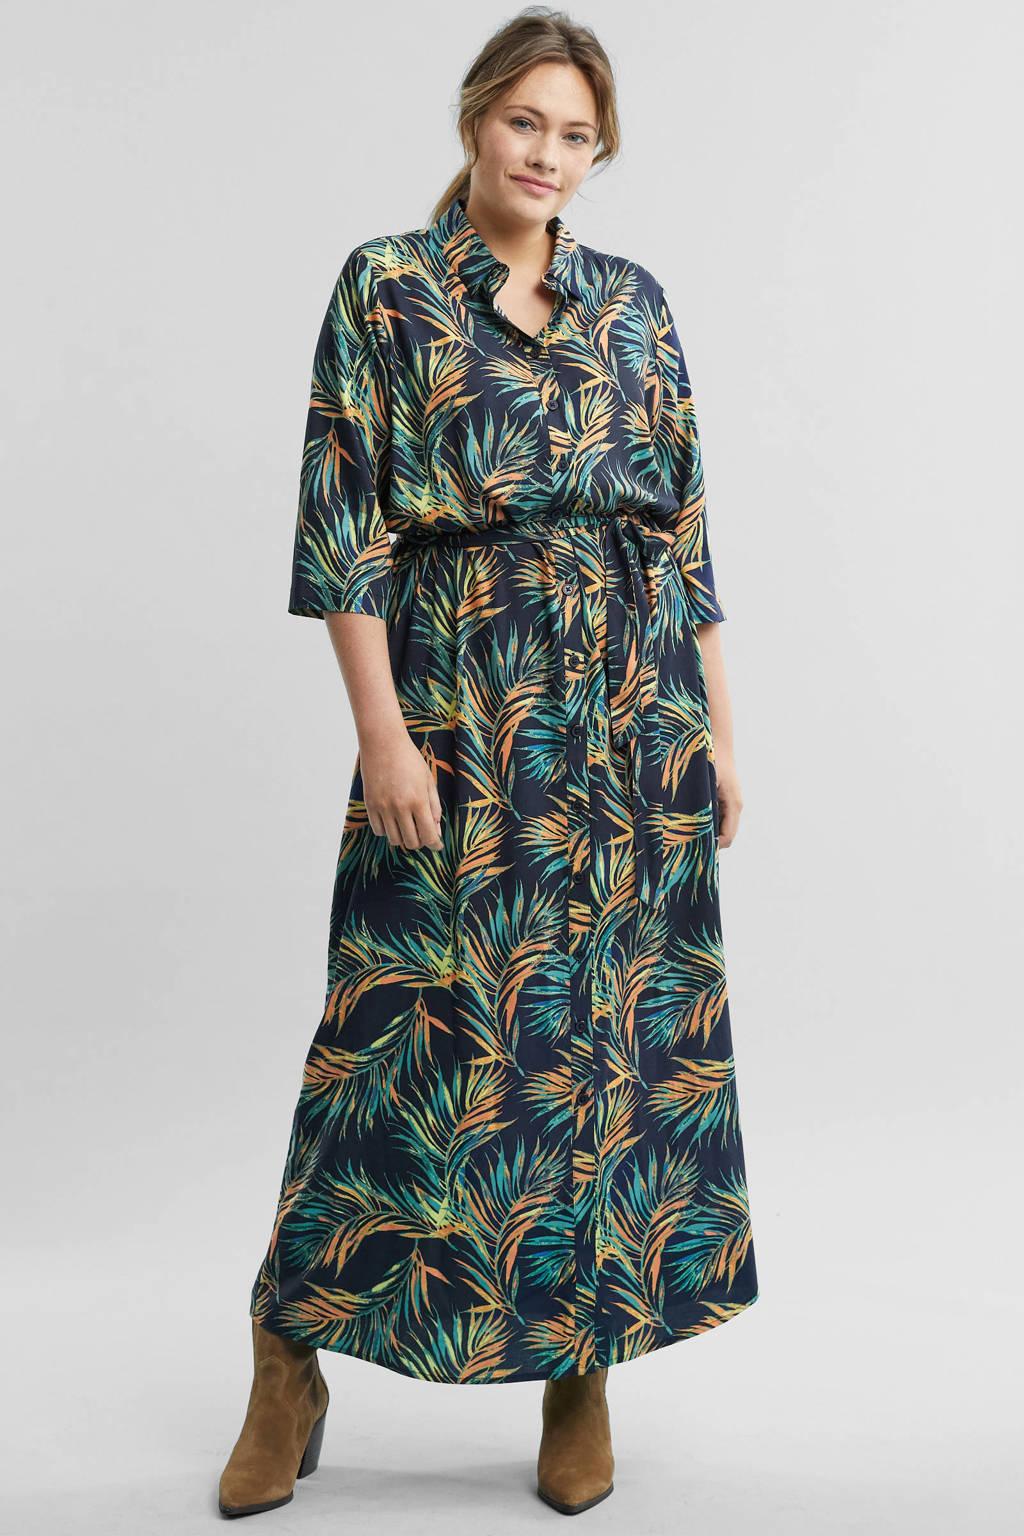 GREAT LOOKS blousejurk met all-over print blauw/groen, Groen